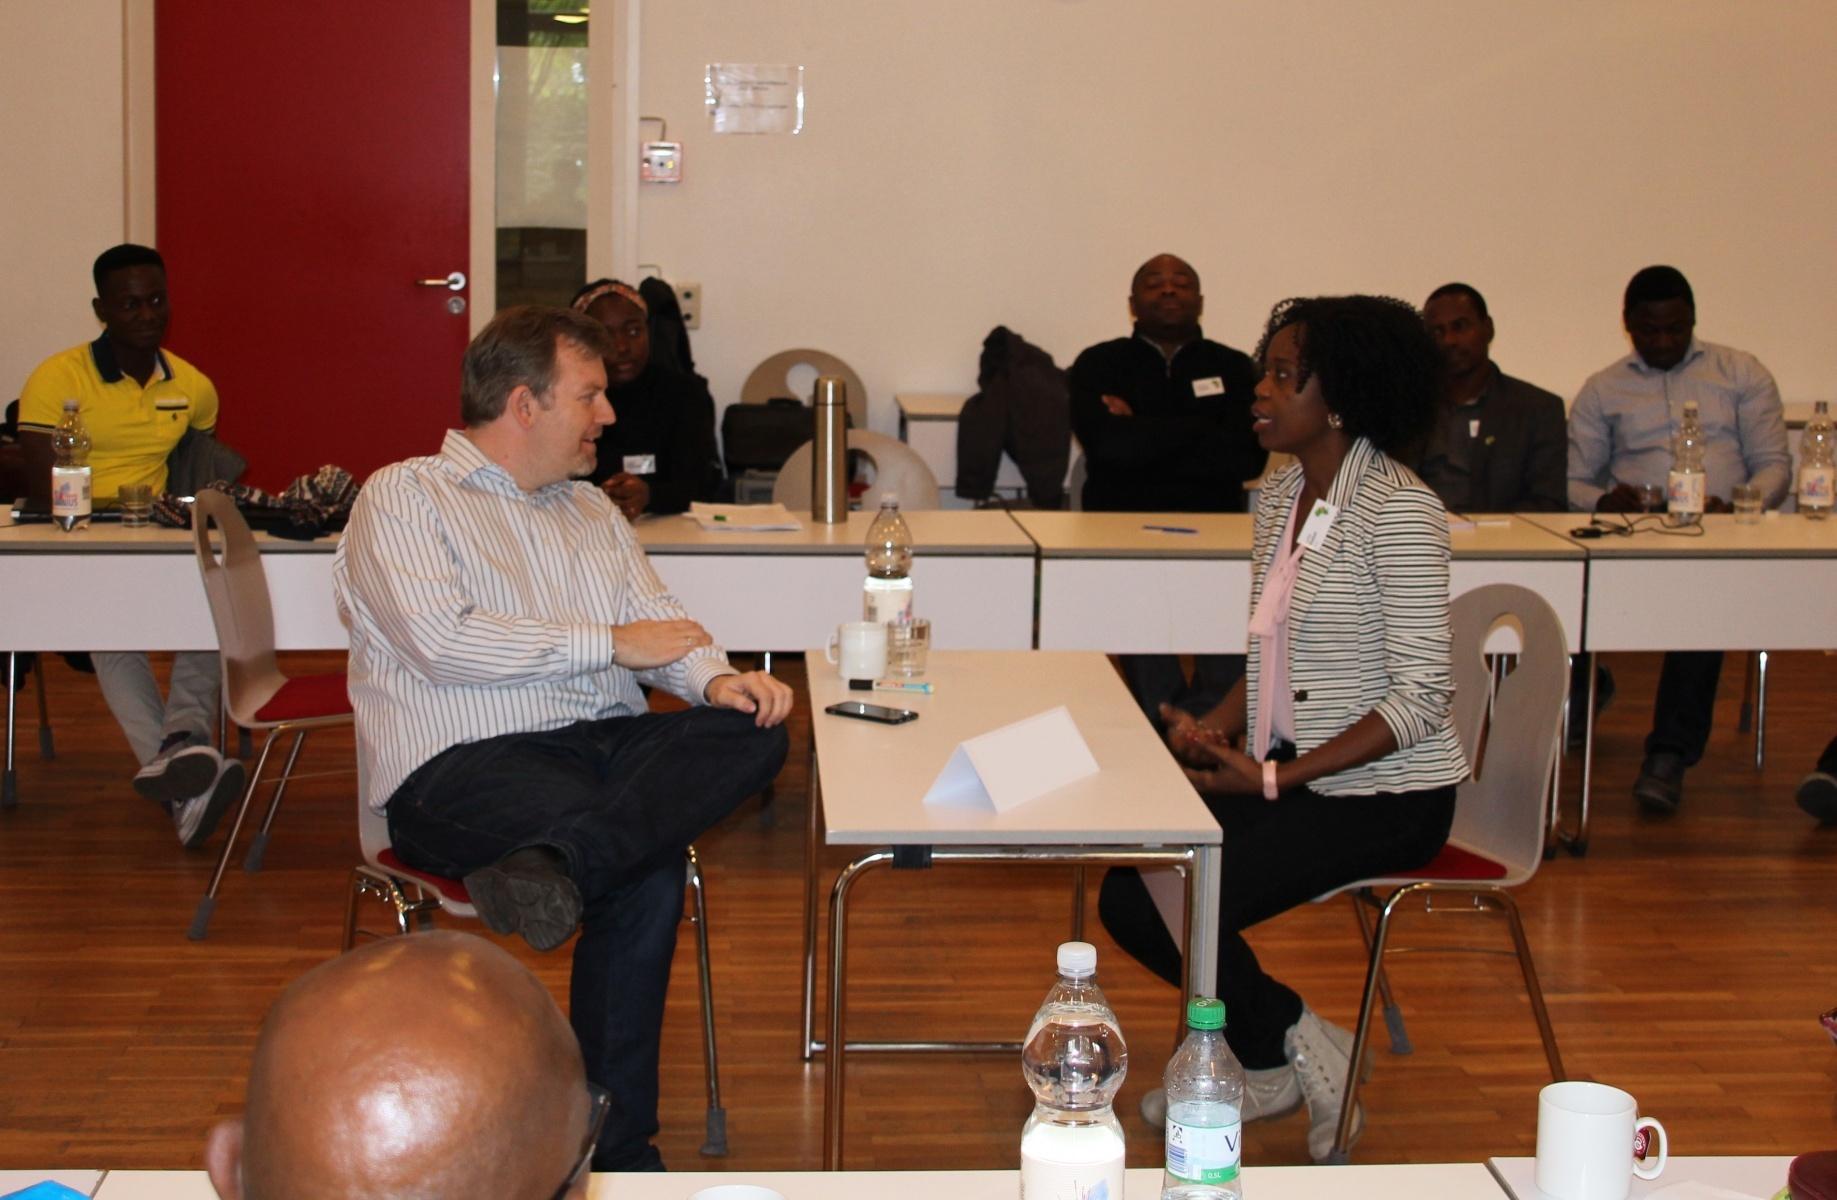 Skills-training on conflict management